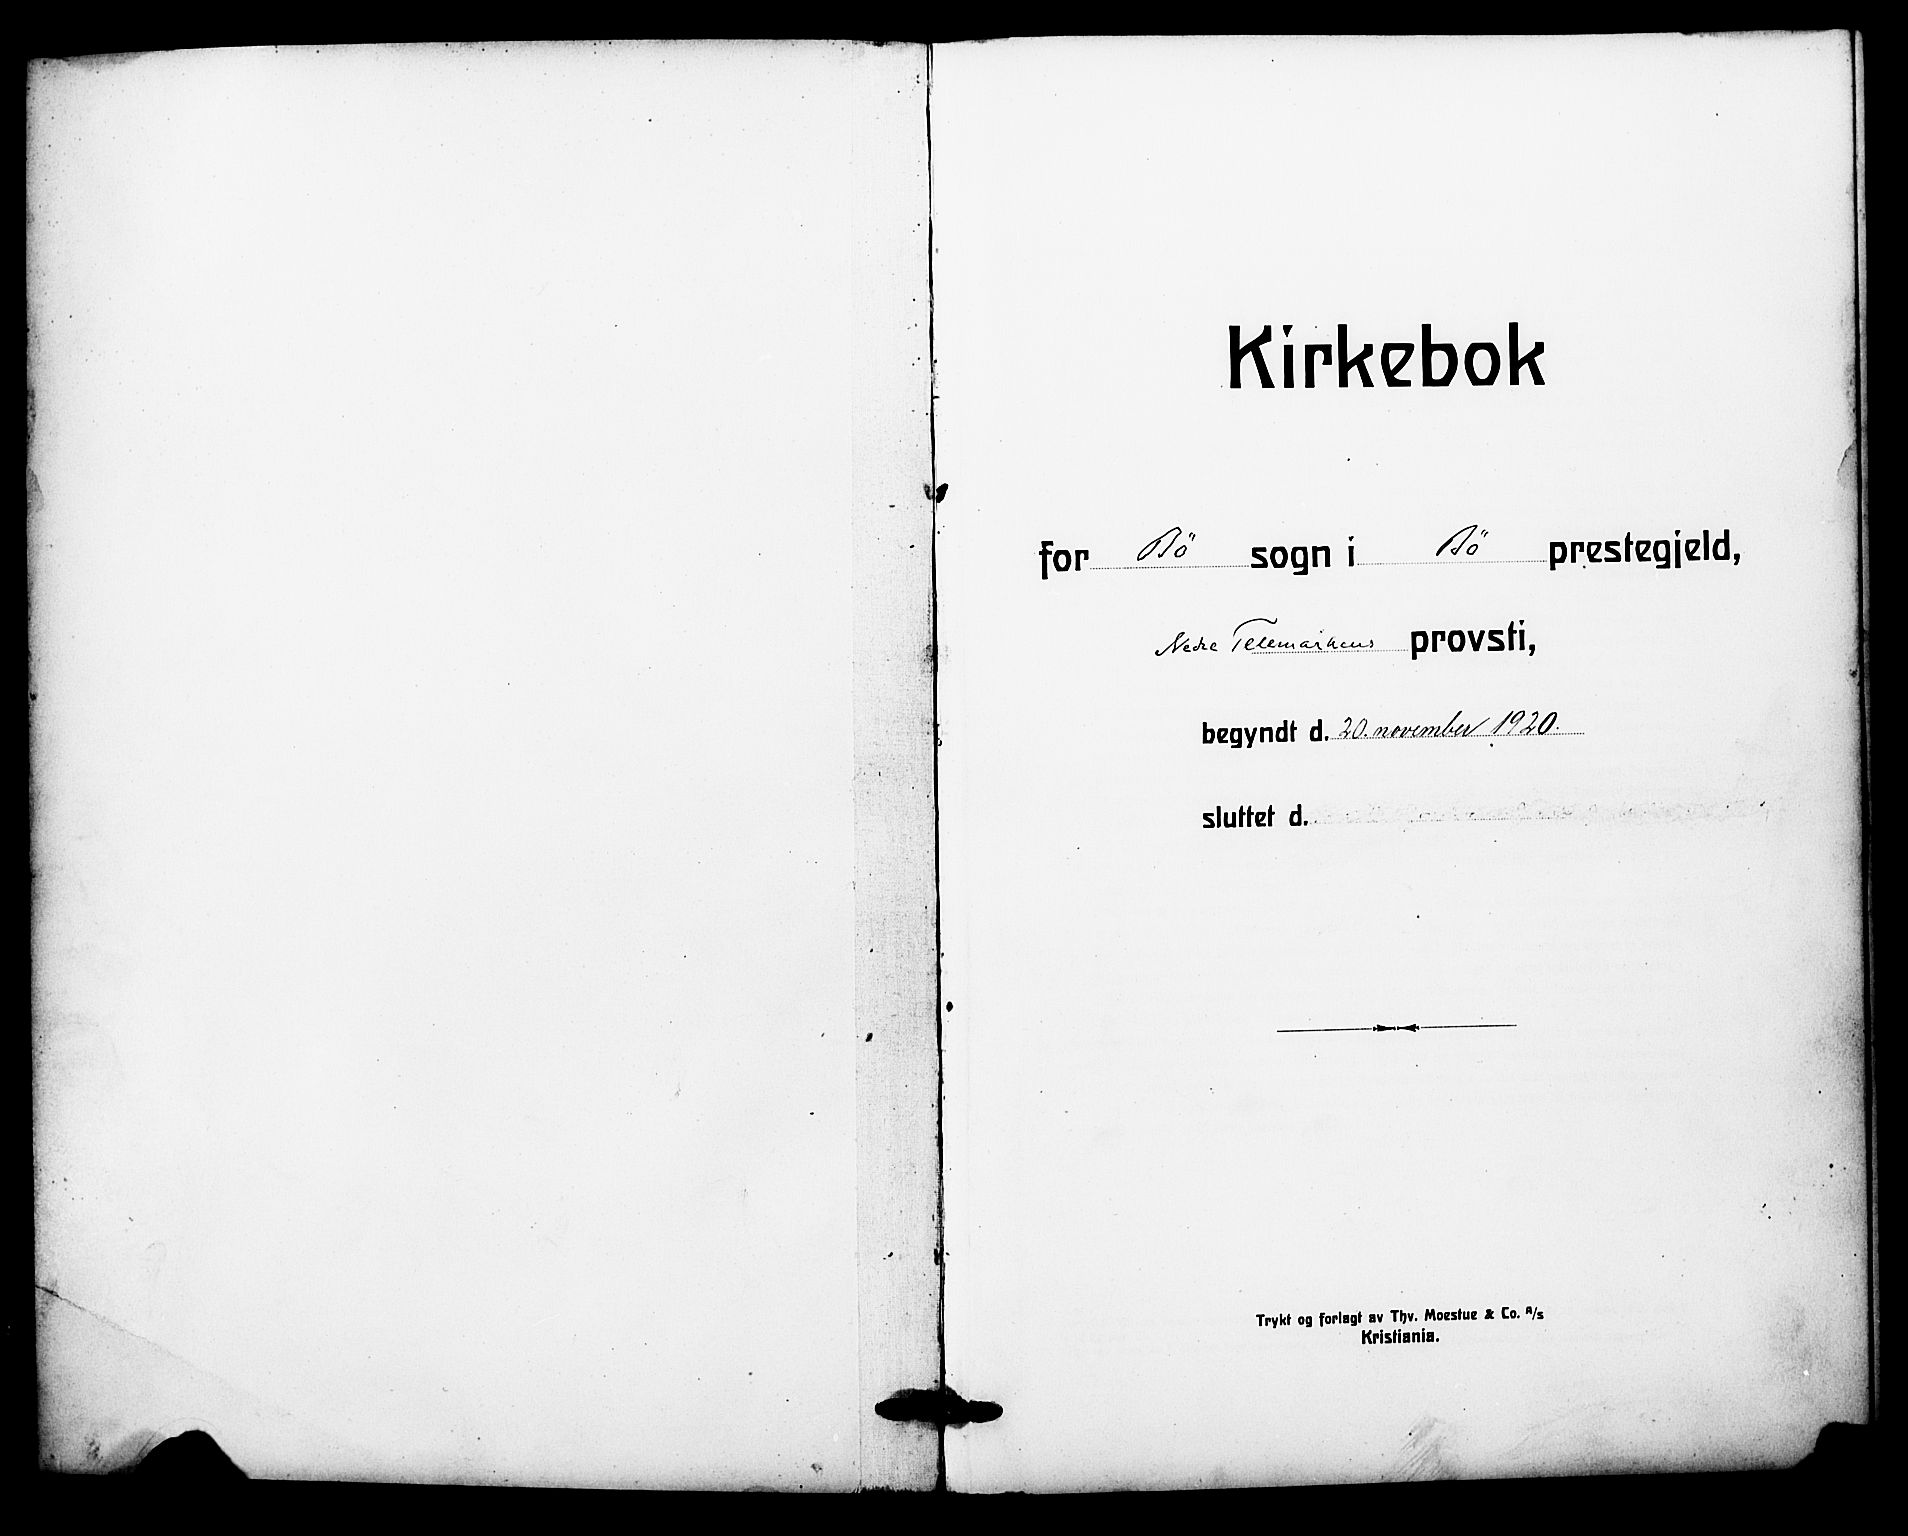 SAKO, Bø kirkebøker, G/Ga/L0008: Klokkerbok nr. 8, 1920-1930